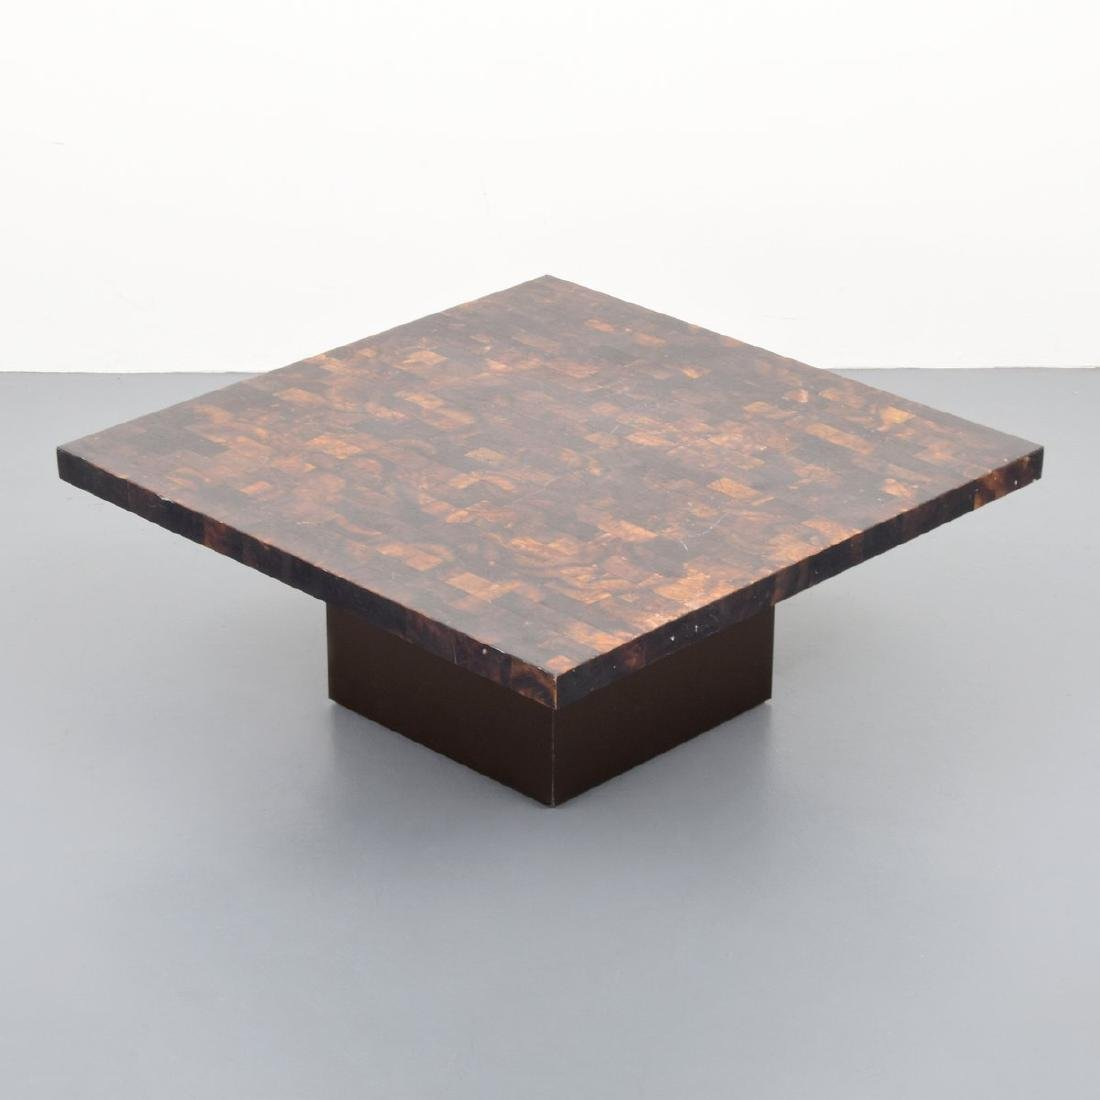 Horn Coffee Table, Manner of Karl Springer